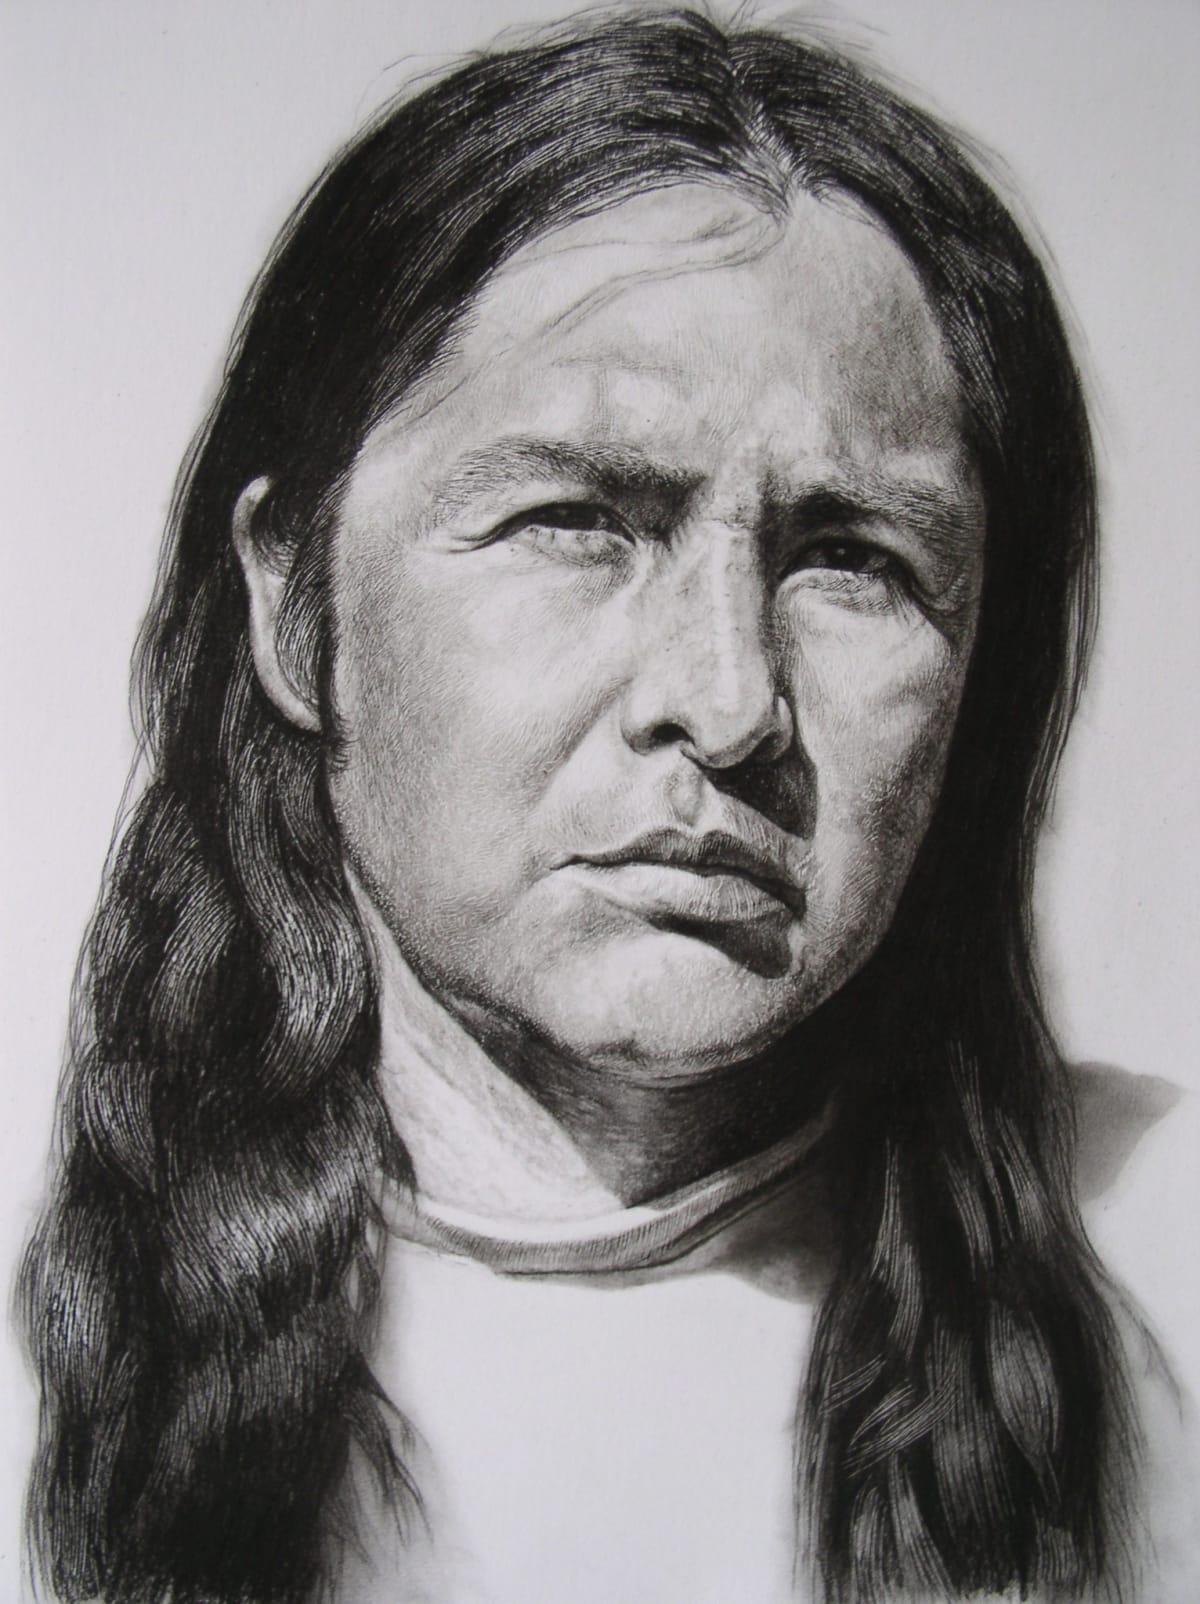 "Andrew Tift Deryl Luijan (taos Pueblo) Charcoal, carbon graphite 23 x 18.9"" 58.5 x 48 cm"